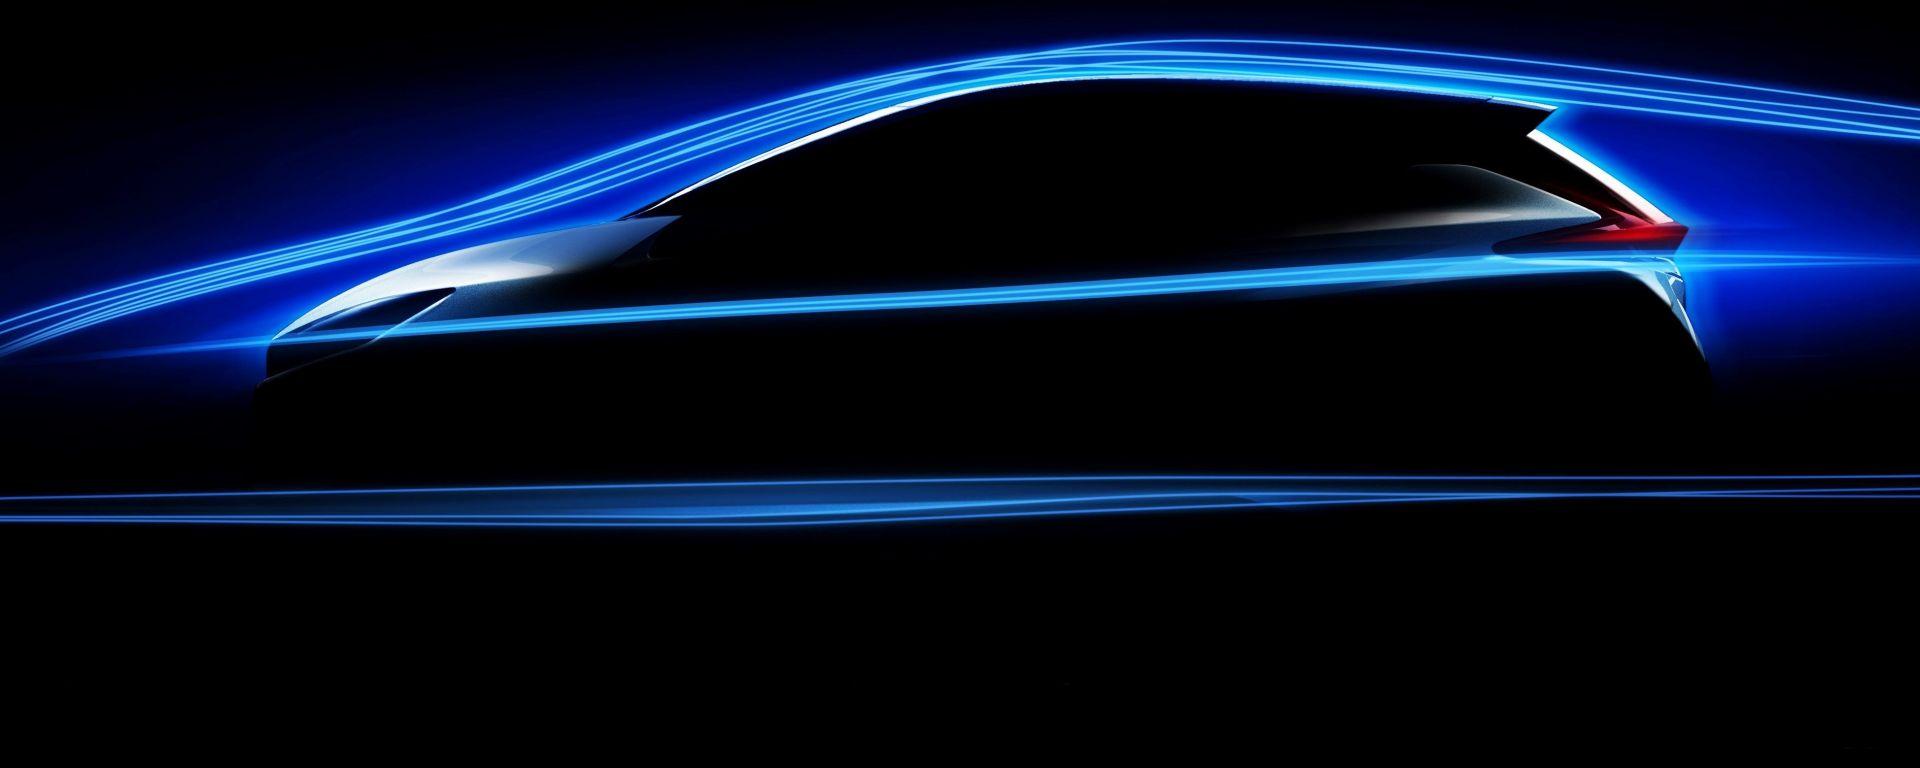 Nuova Nissan Leaf, avanzati studi aerodinamici